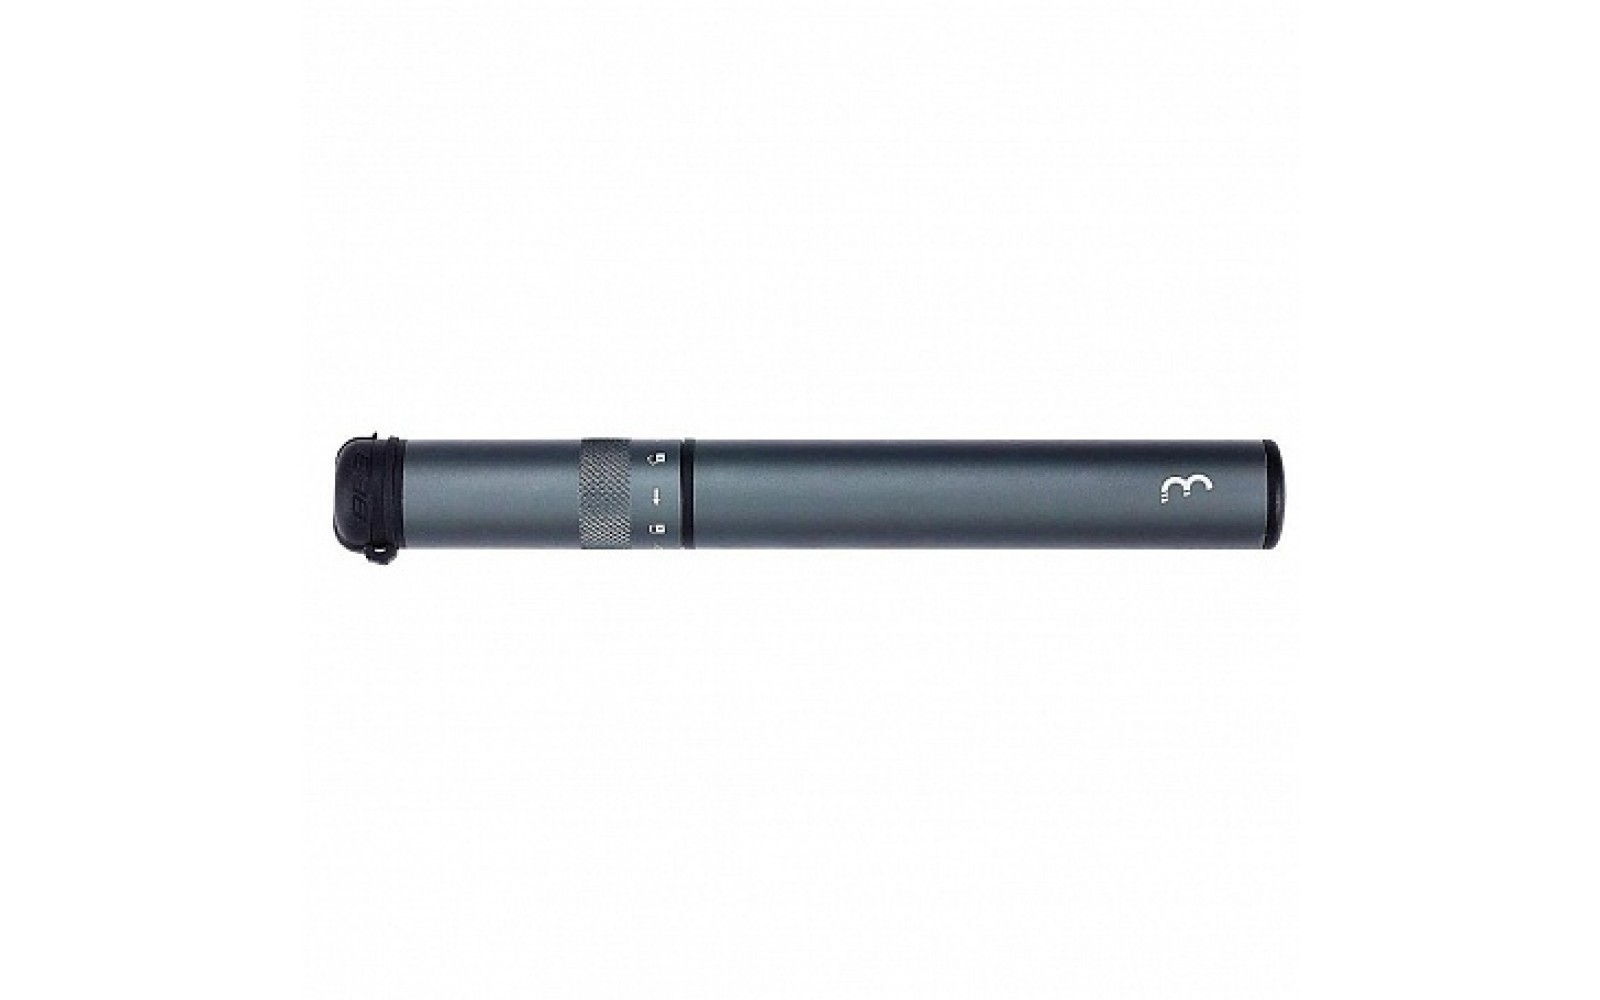 "Насос ручной BBB Samurai 210mm telescopic серый <i class=""icon product-card_star-mask""></i>"